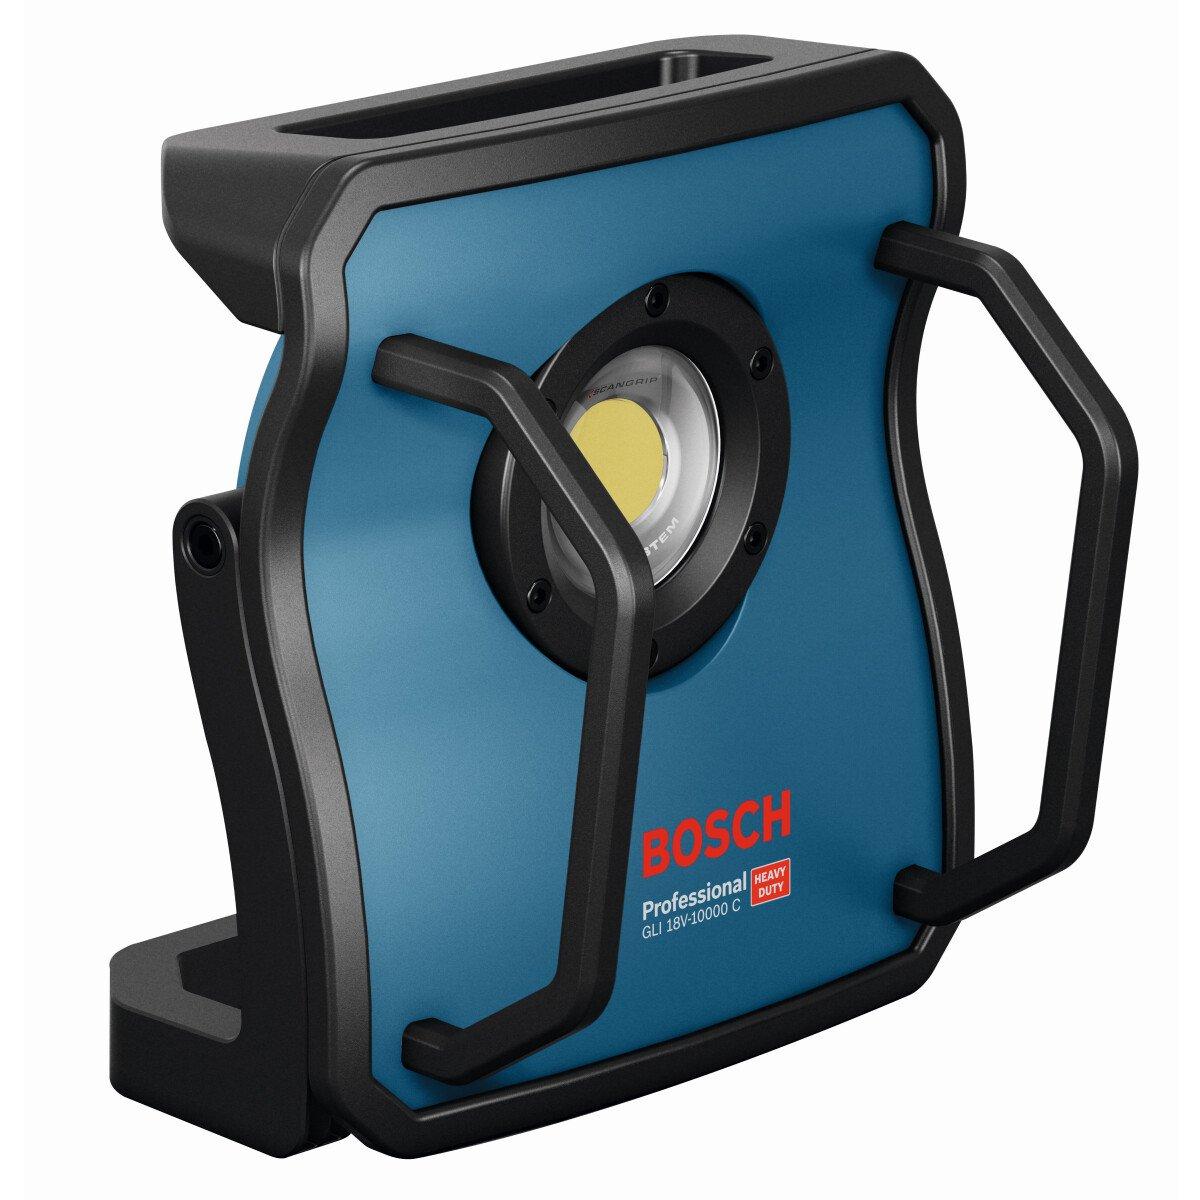 Bosch GLI 18V-10000 C 18v Body Only Floodlight Connection Ready in Carton